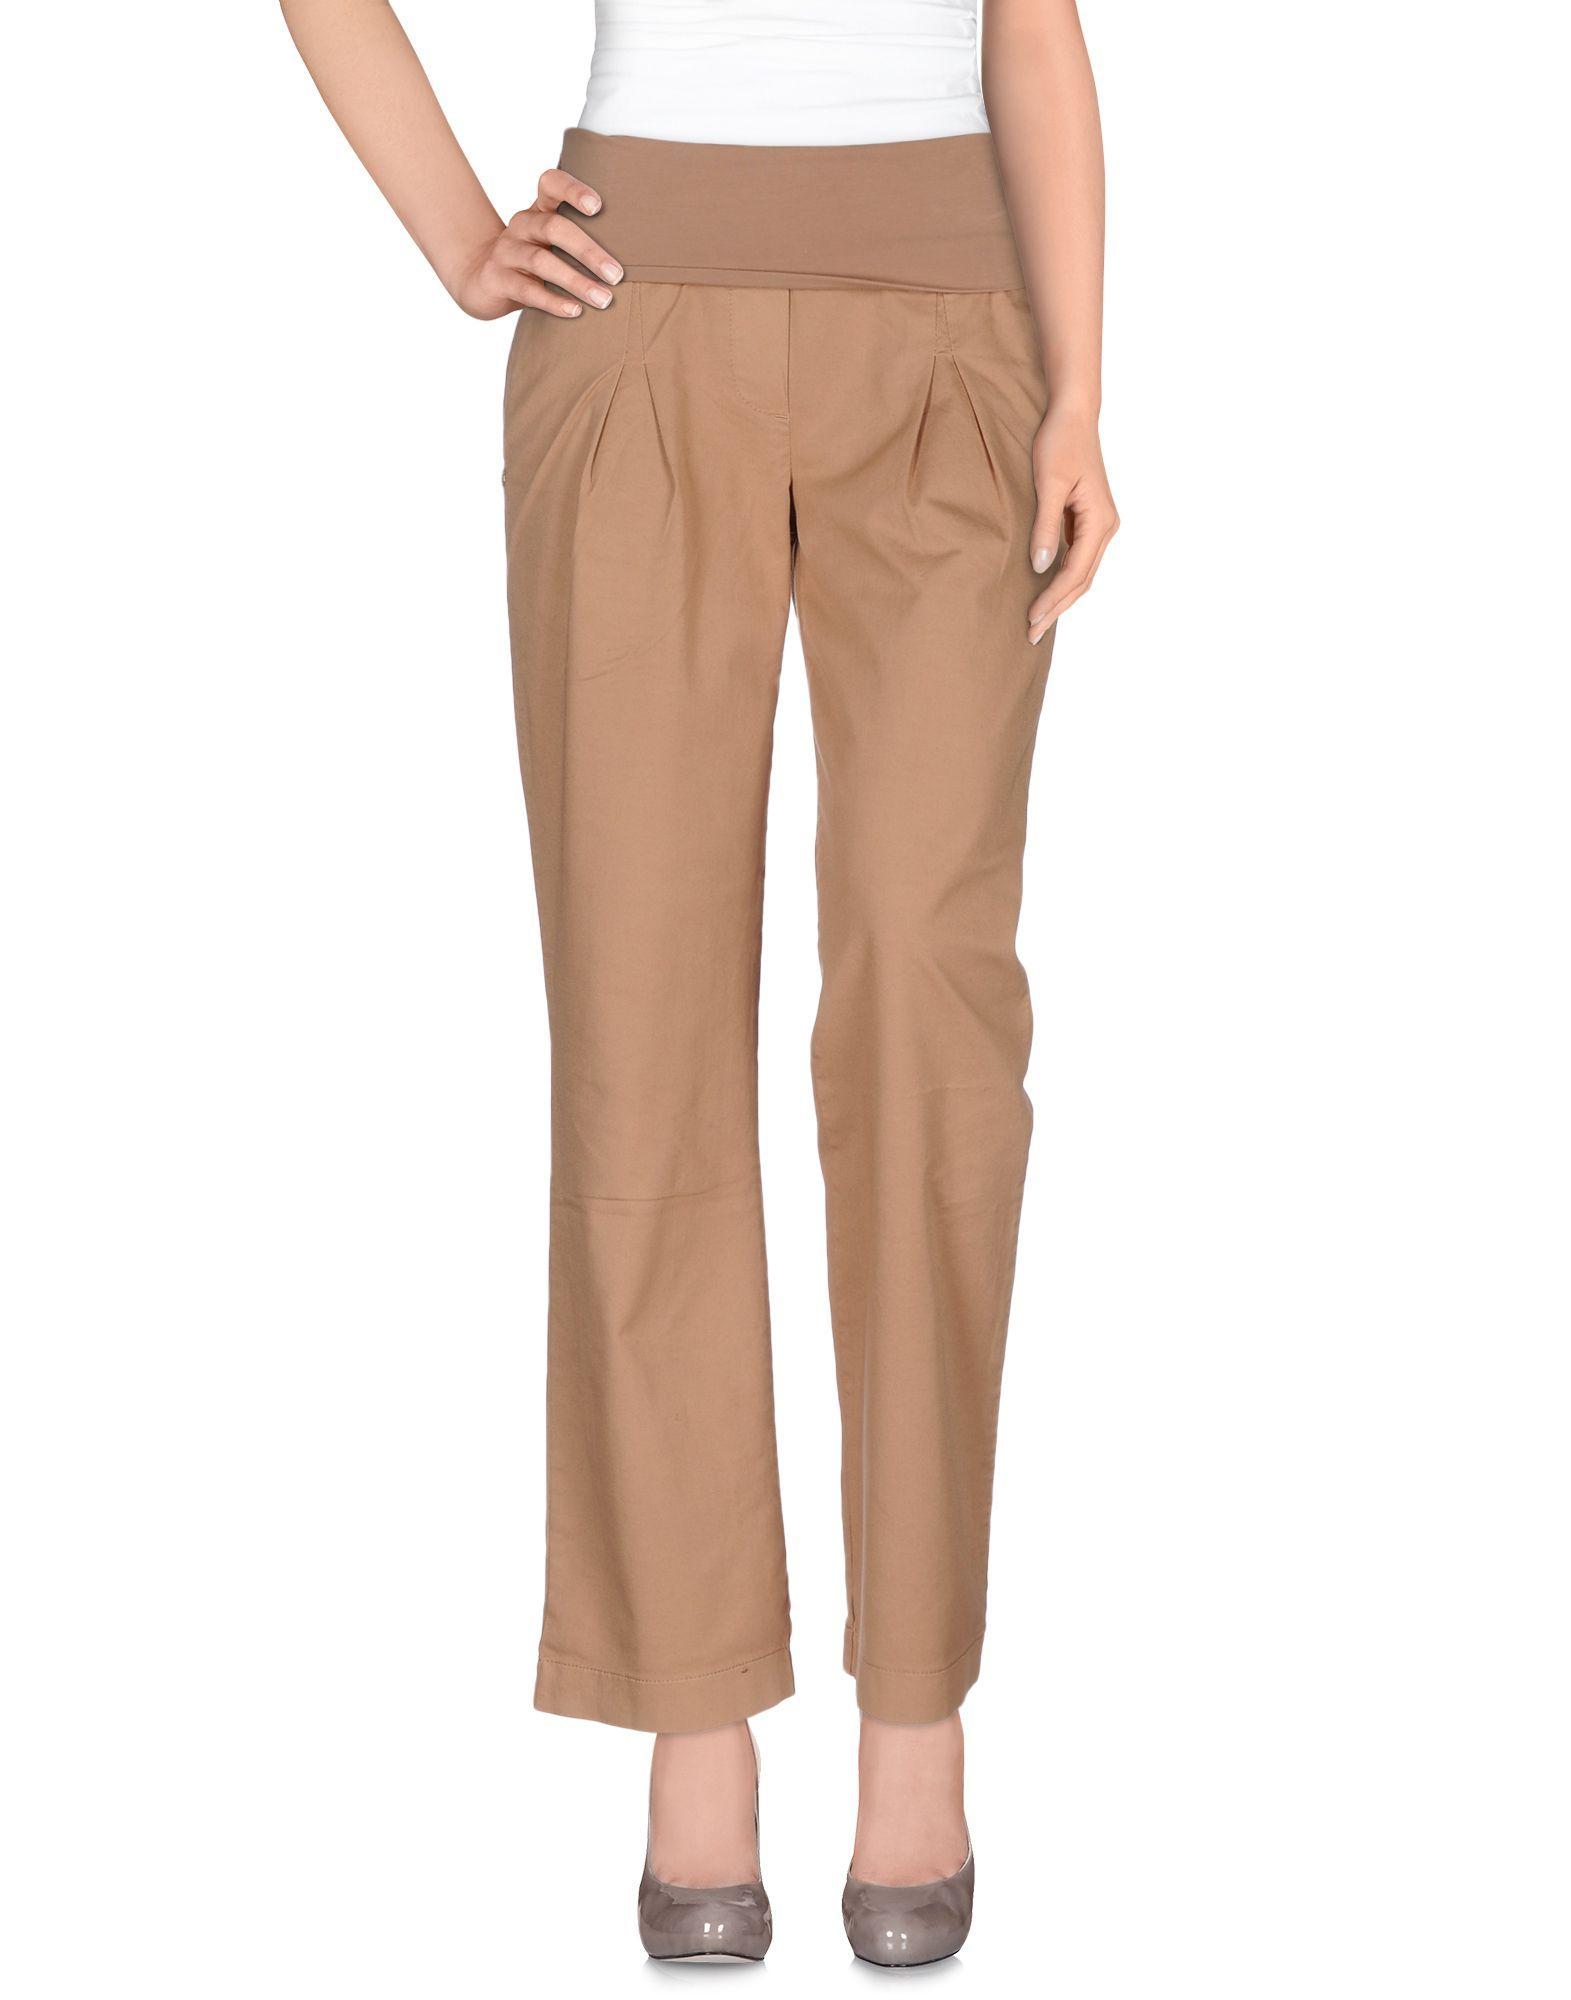 Manila Grace Sand Cotton Trousers